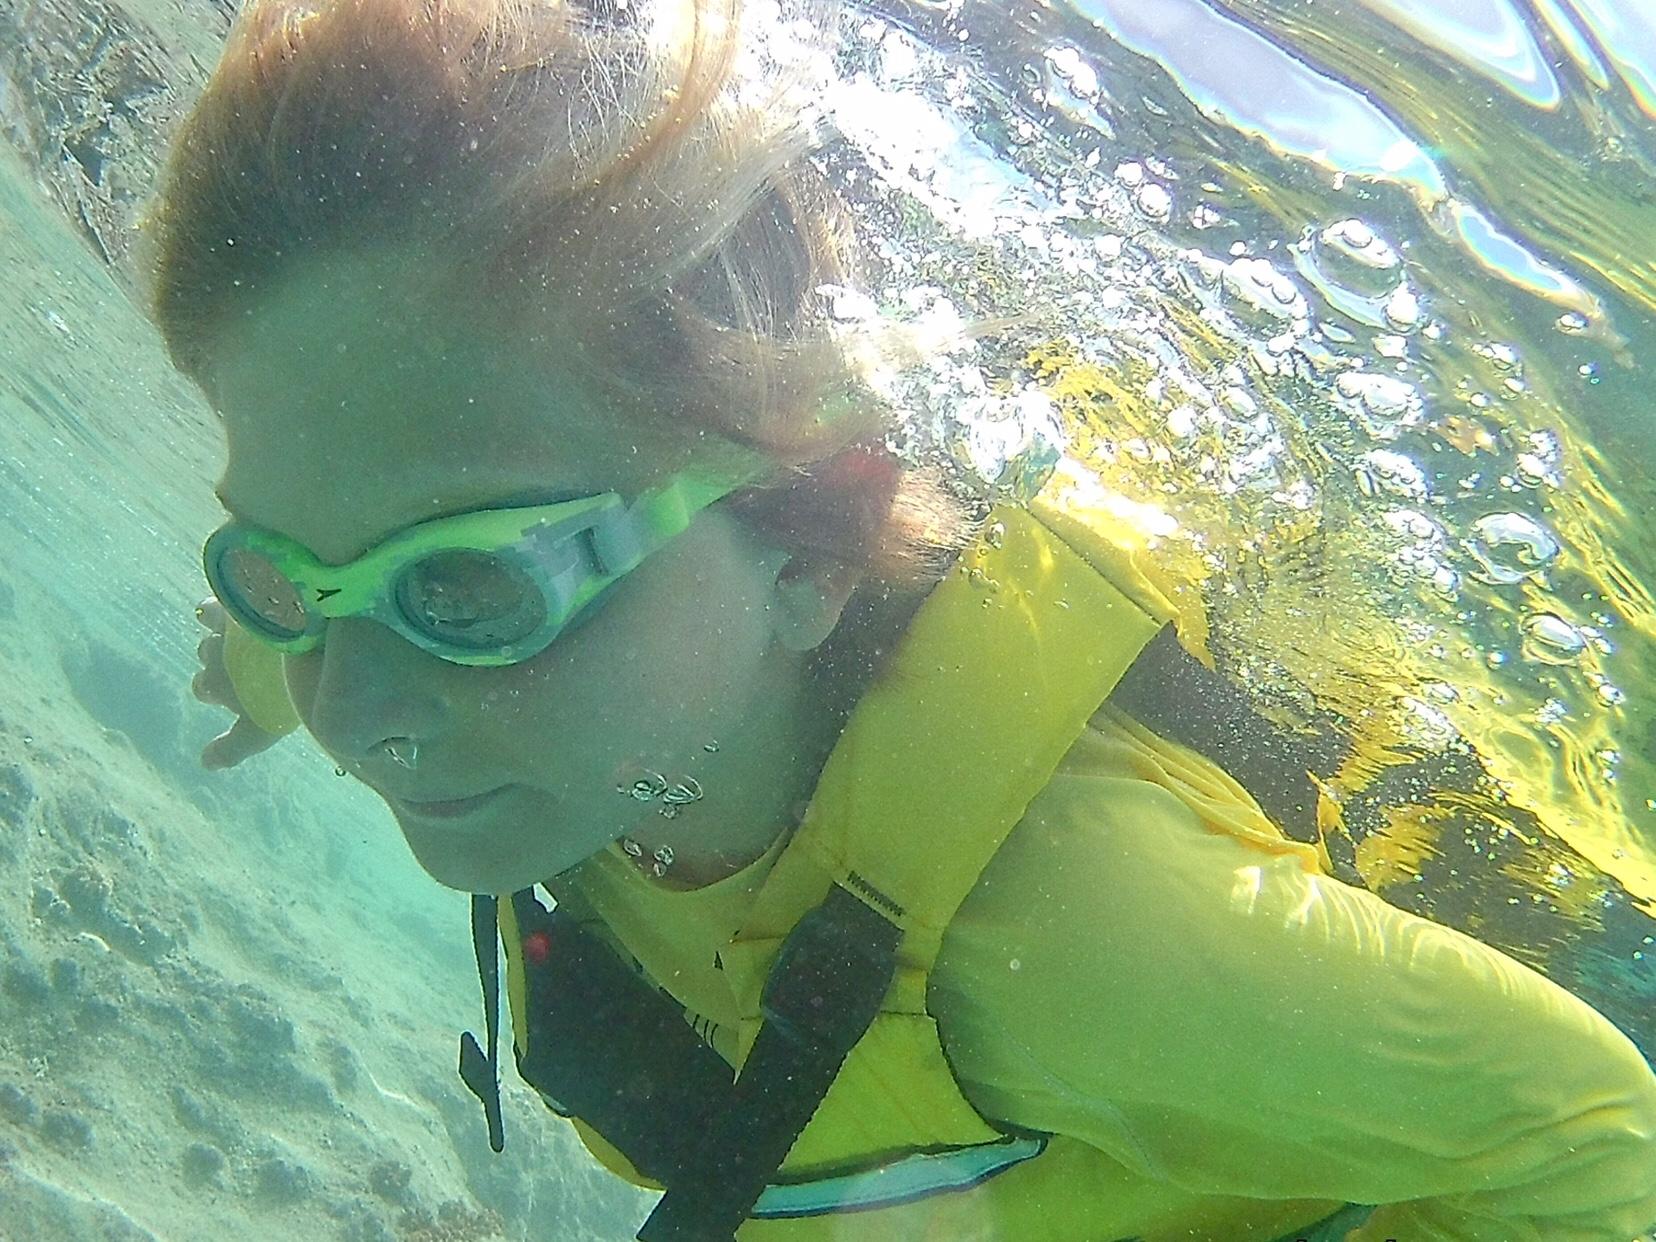 Brad underwater